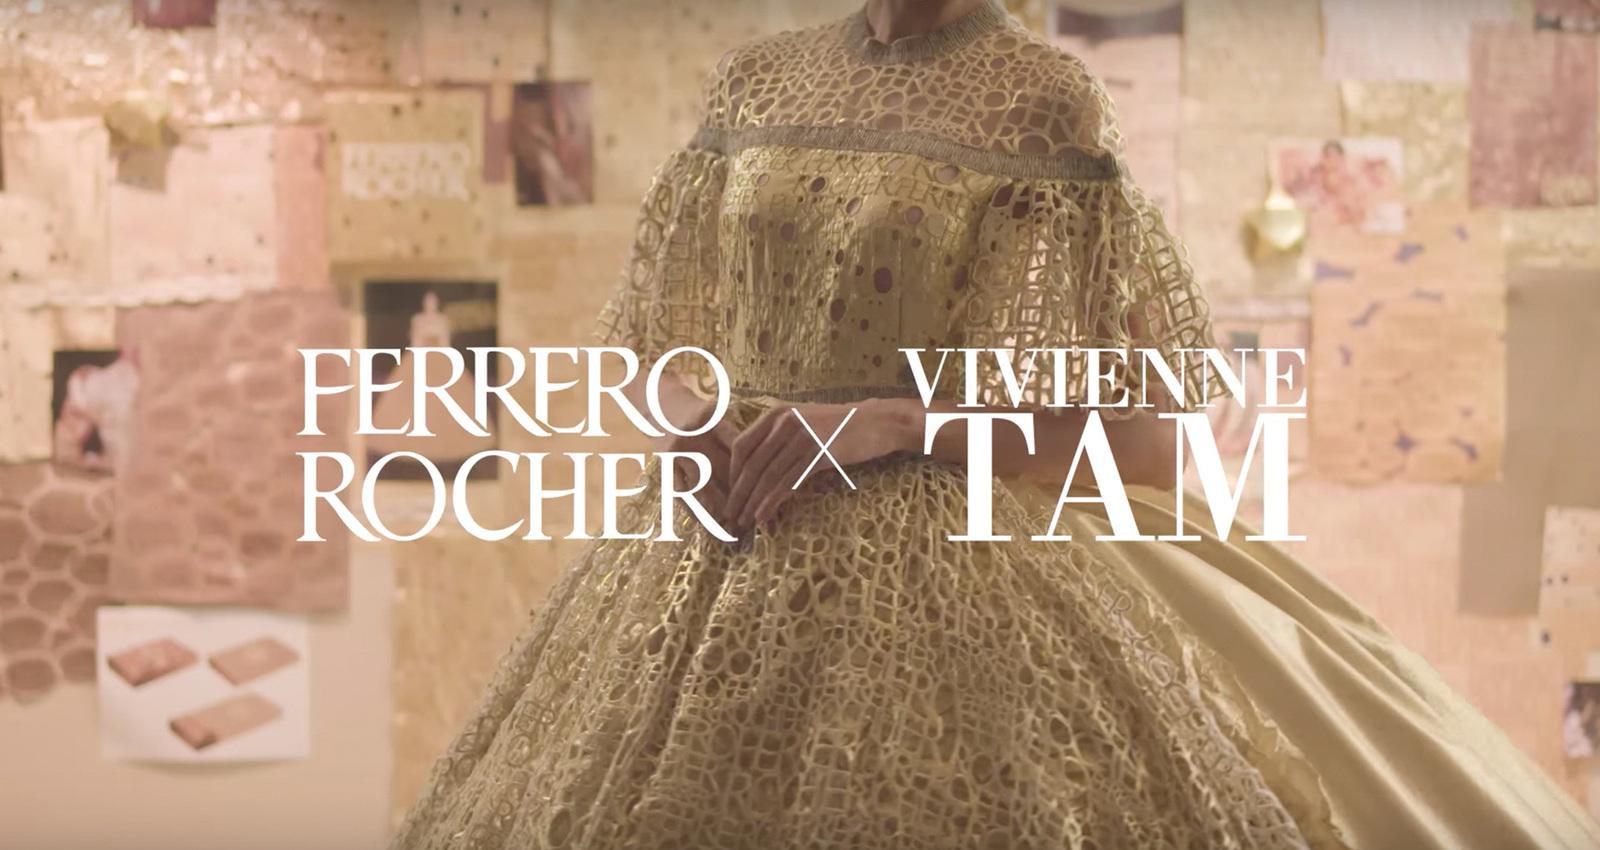 Ferrero Rocher x Vivienne Tam